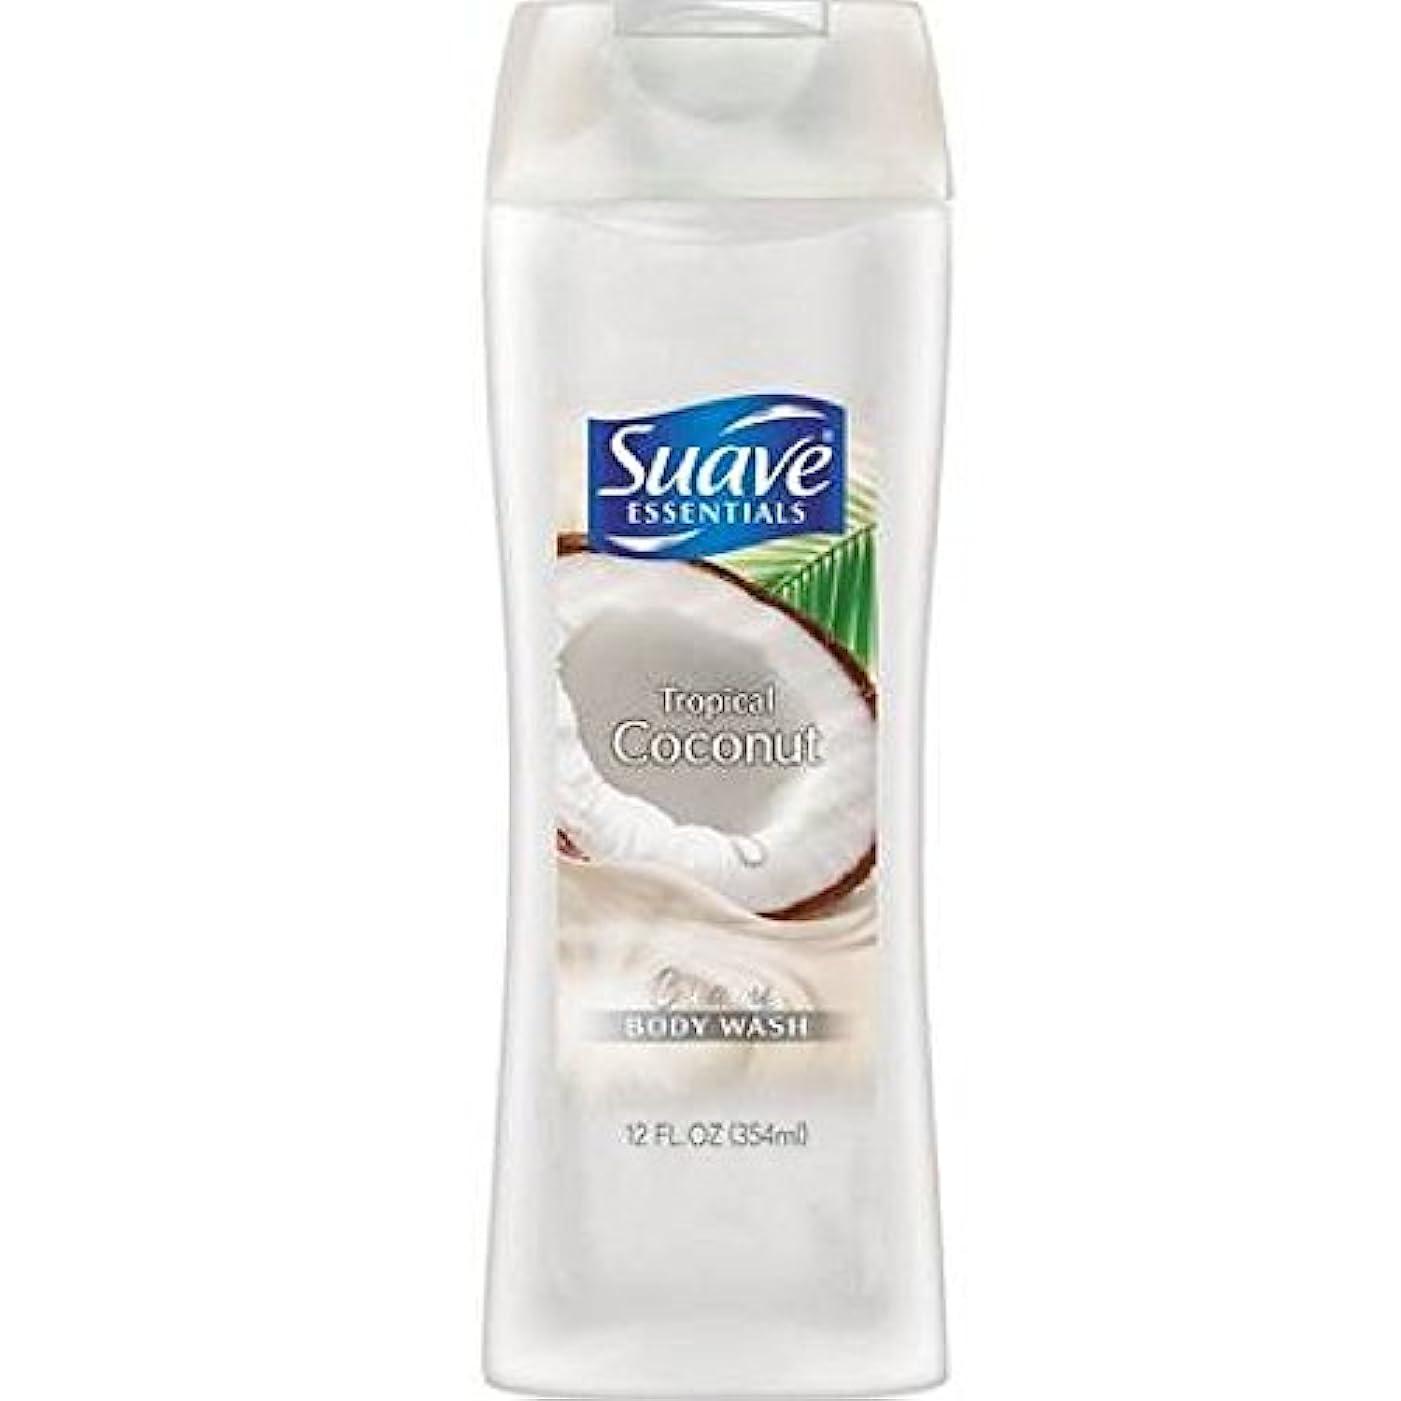 Suave Naturals Body Wash - Tropical Coconut - 12 oz - 2 pk by Suave [並行輸入品]